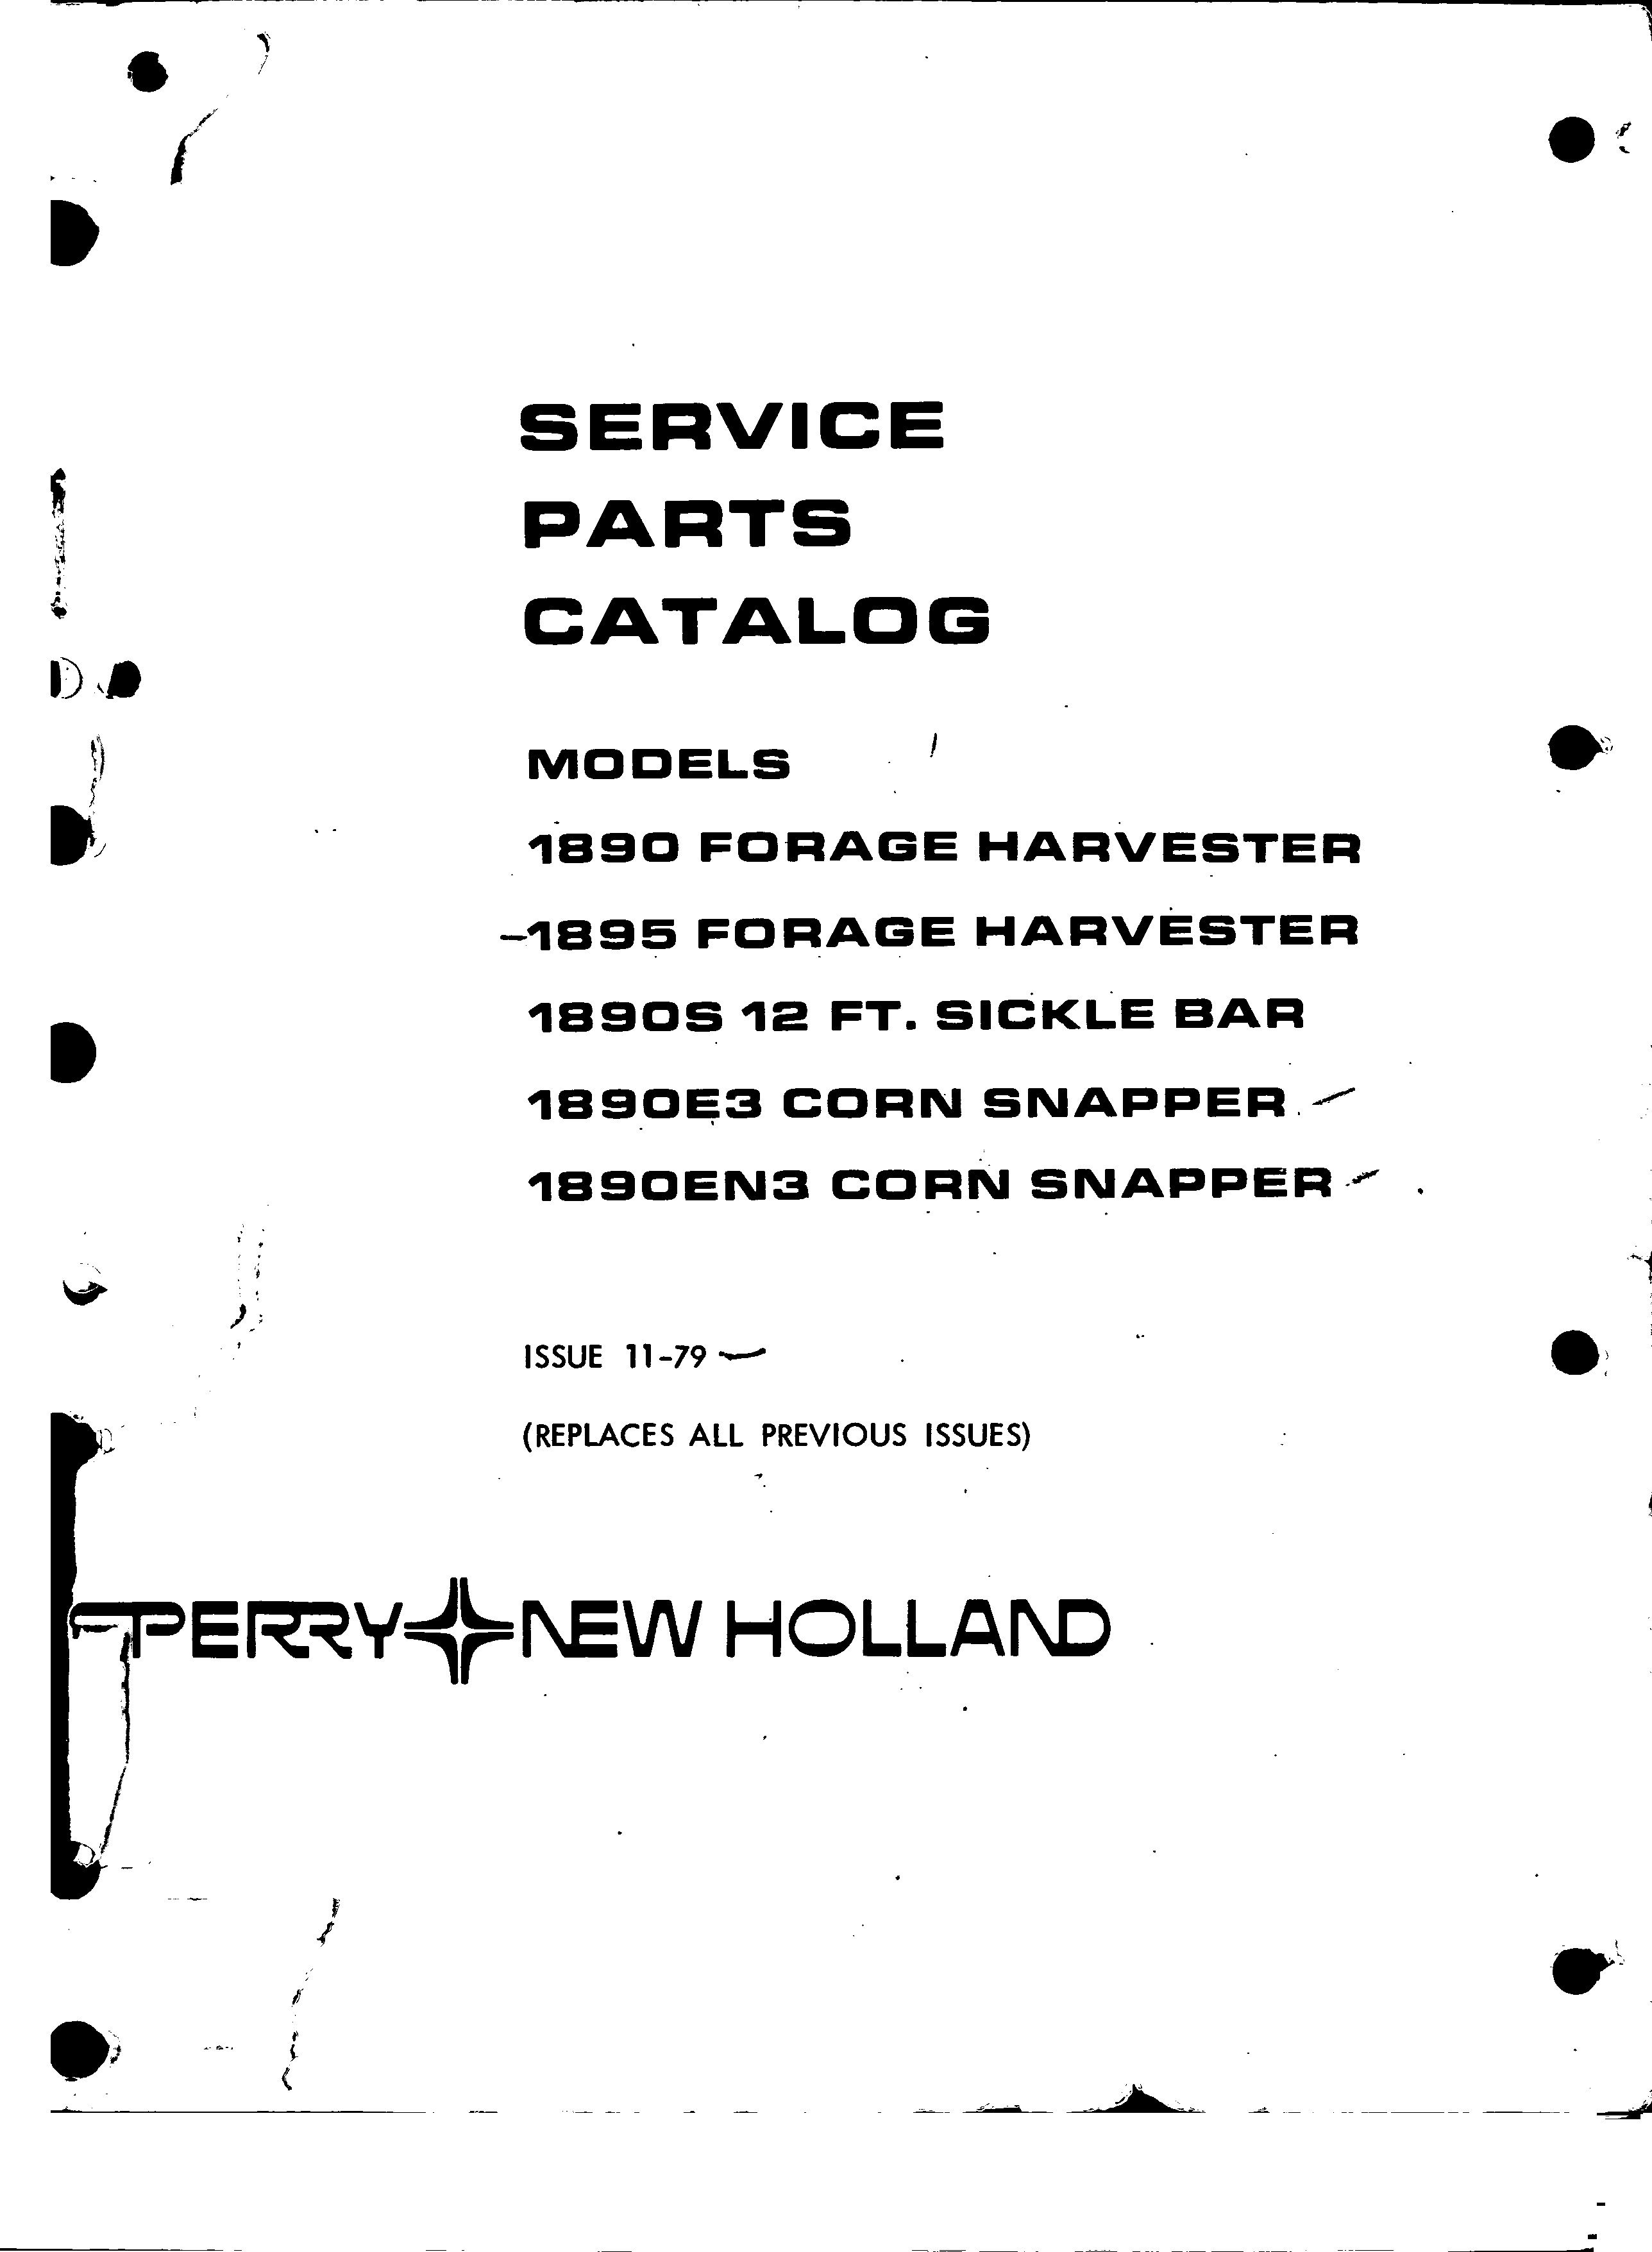 New Holland 1890S 12 FT Sickle bar Service Parts Catalogue